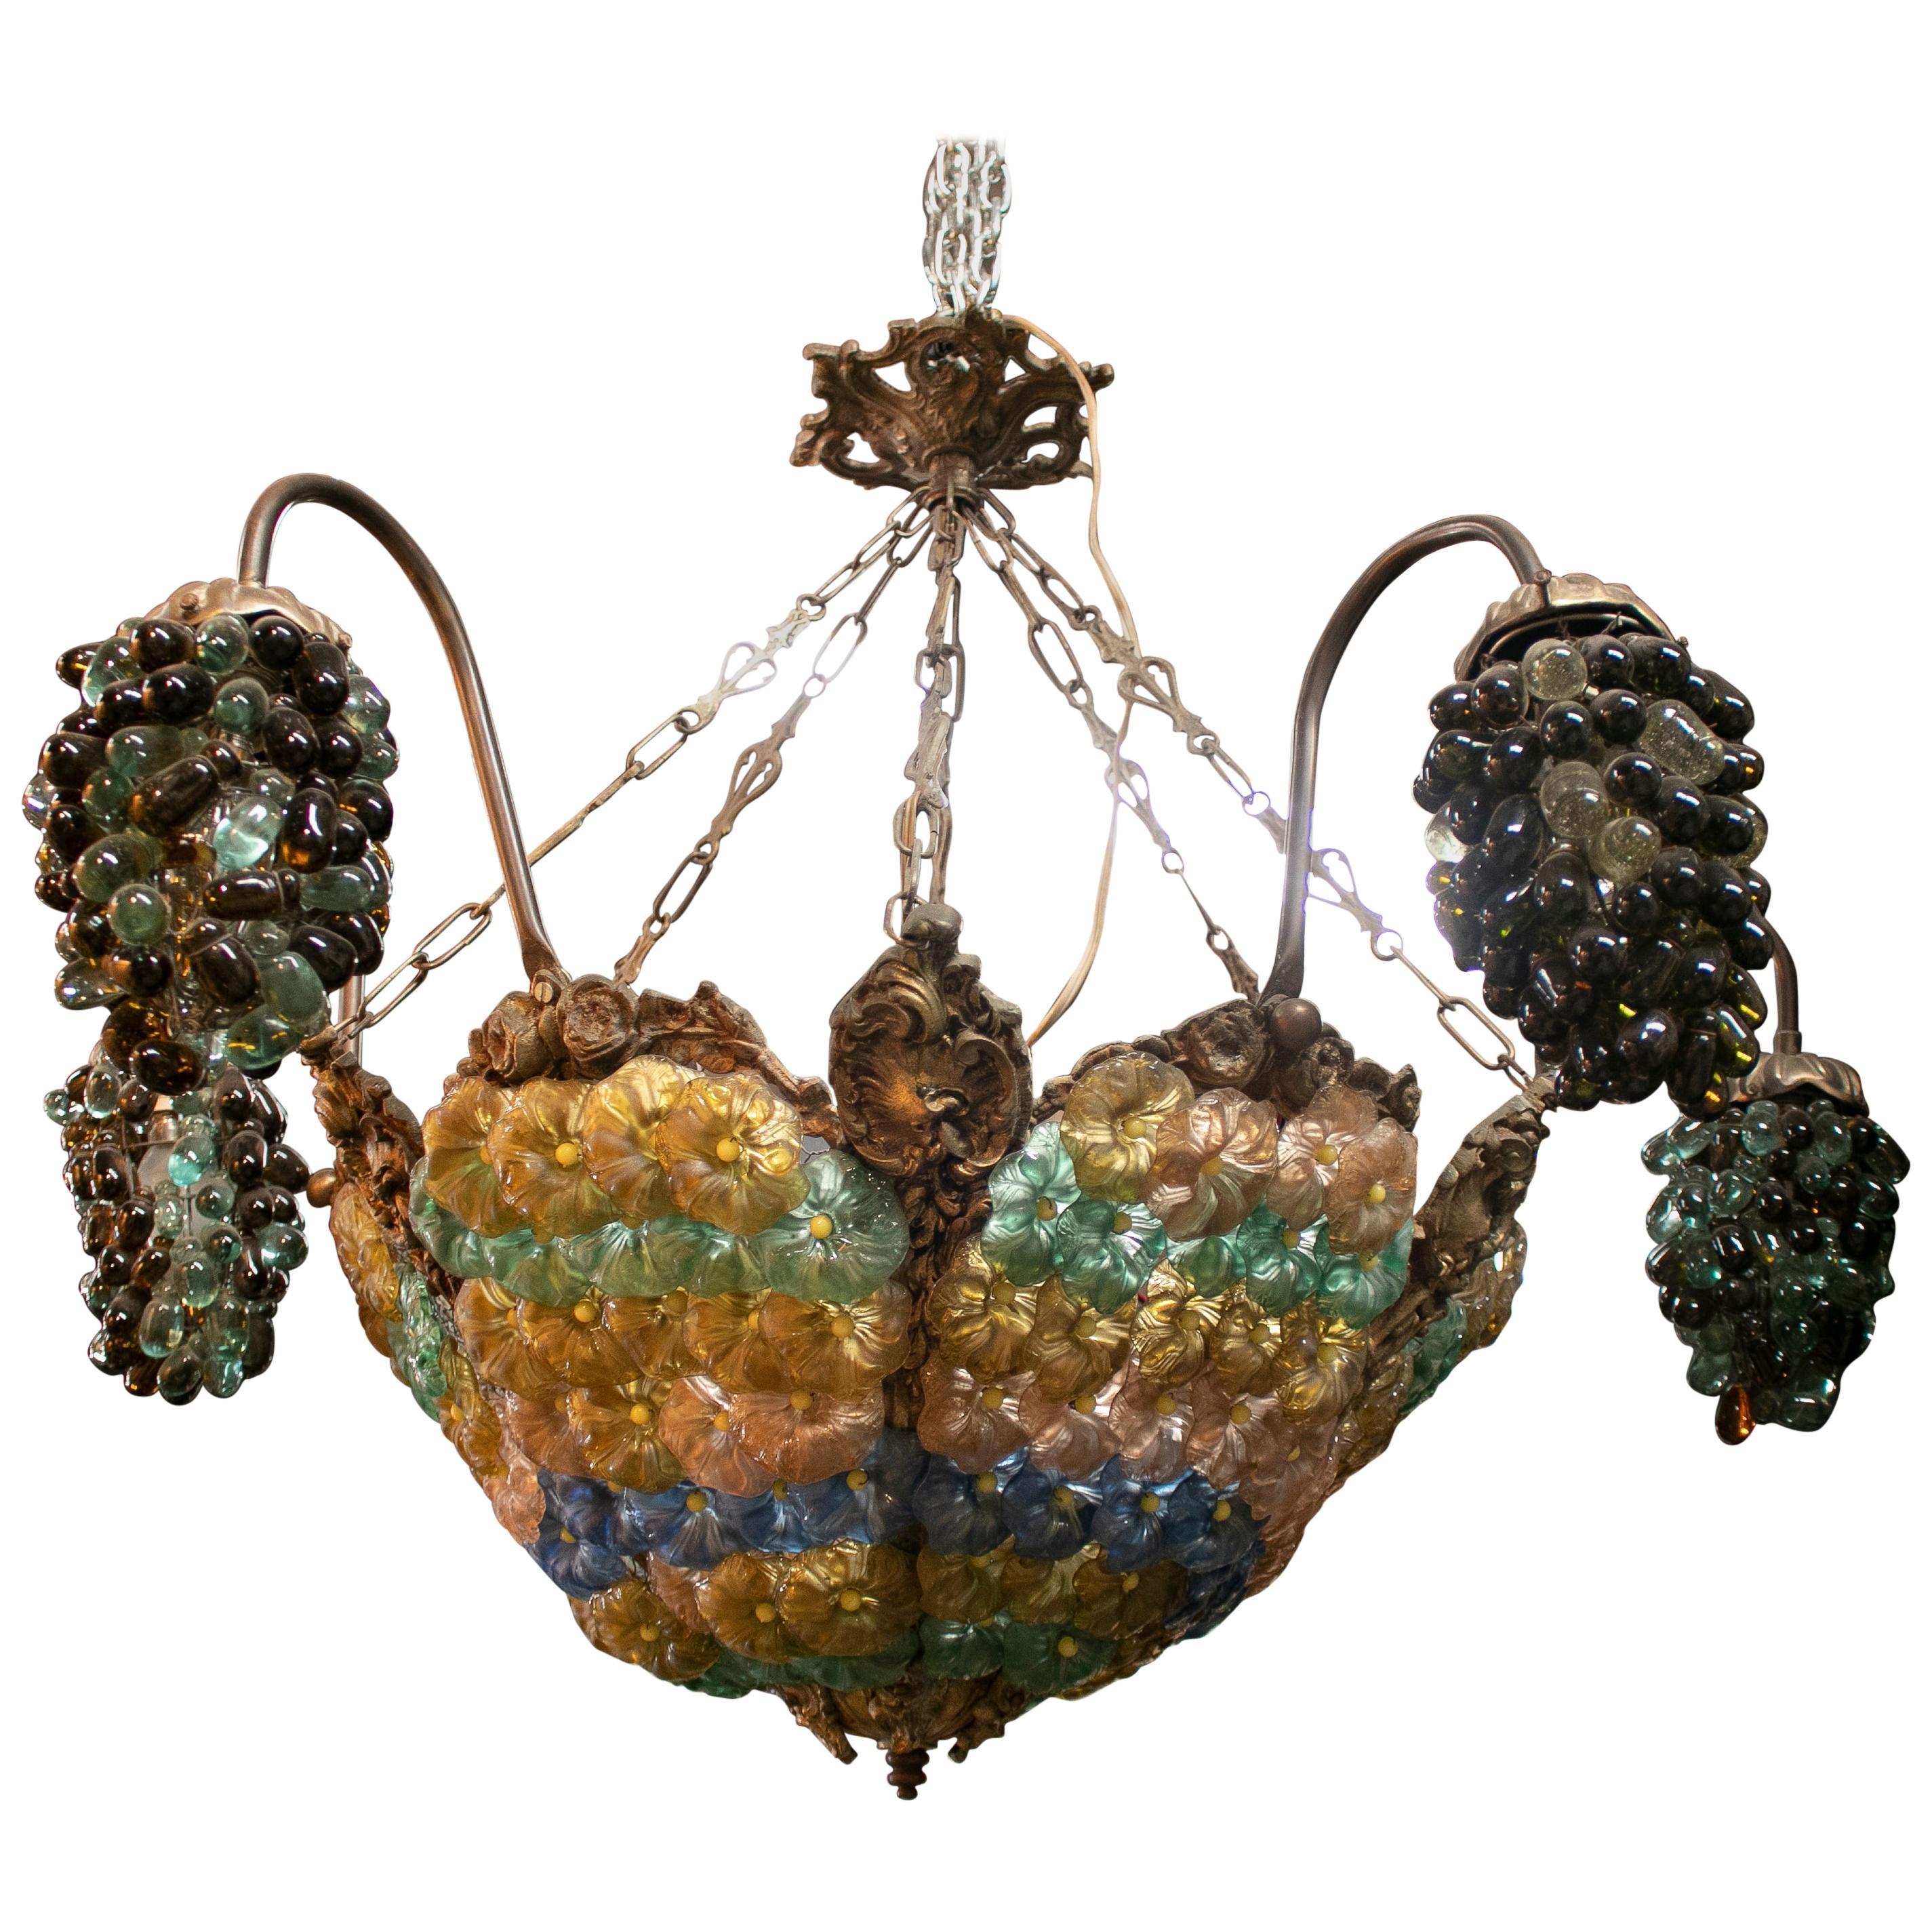 1970s Italian Venetian Murano Glass Ceiling Lamp w/ Grapes & Flowers